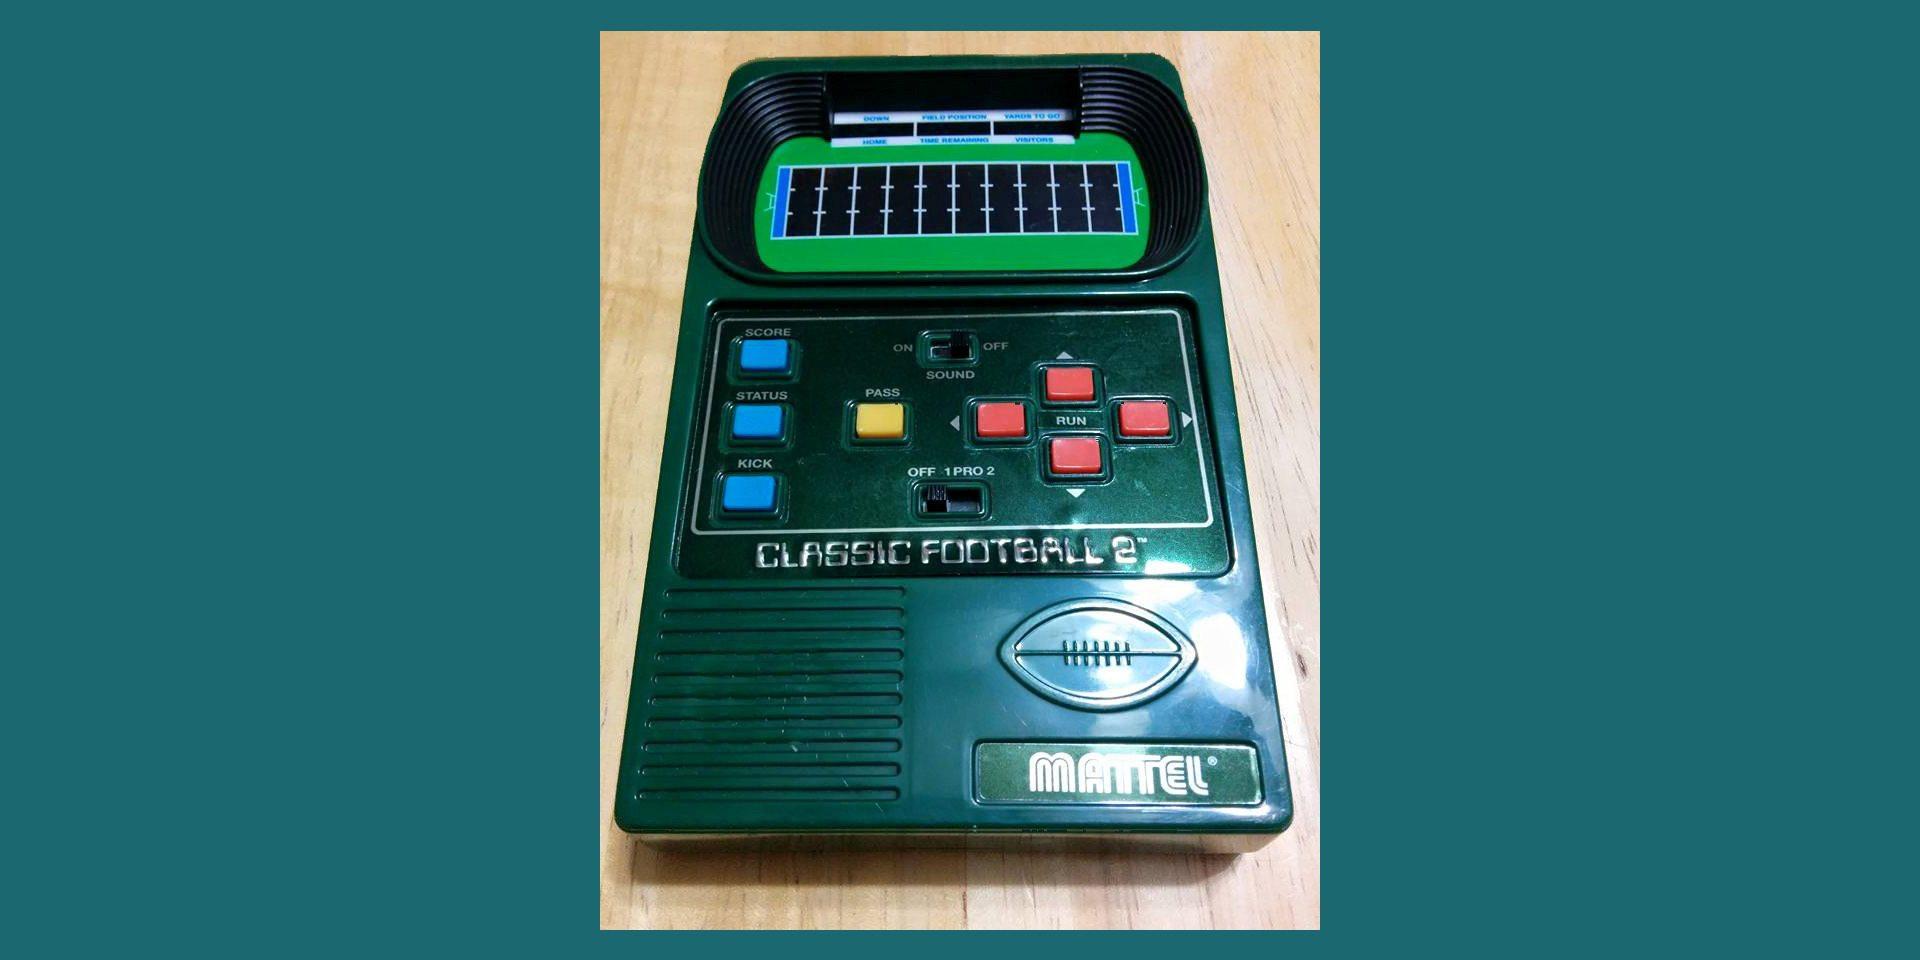 Mattel Football Video Game